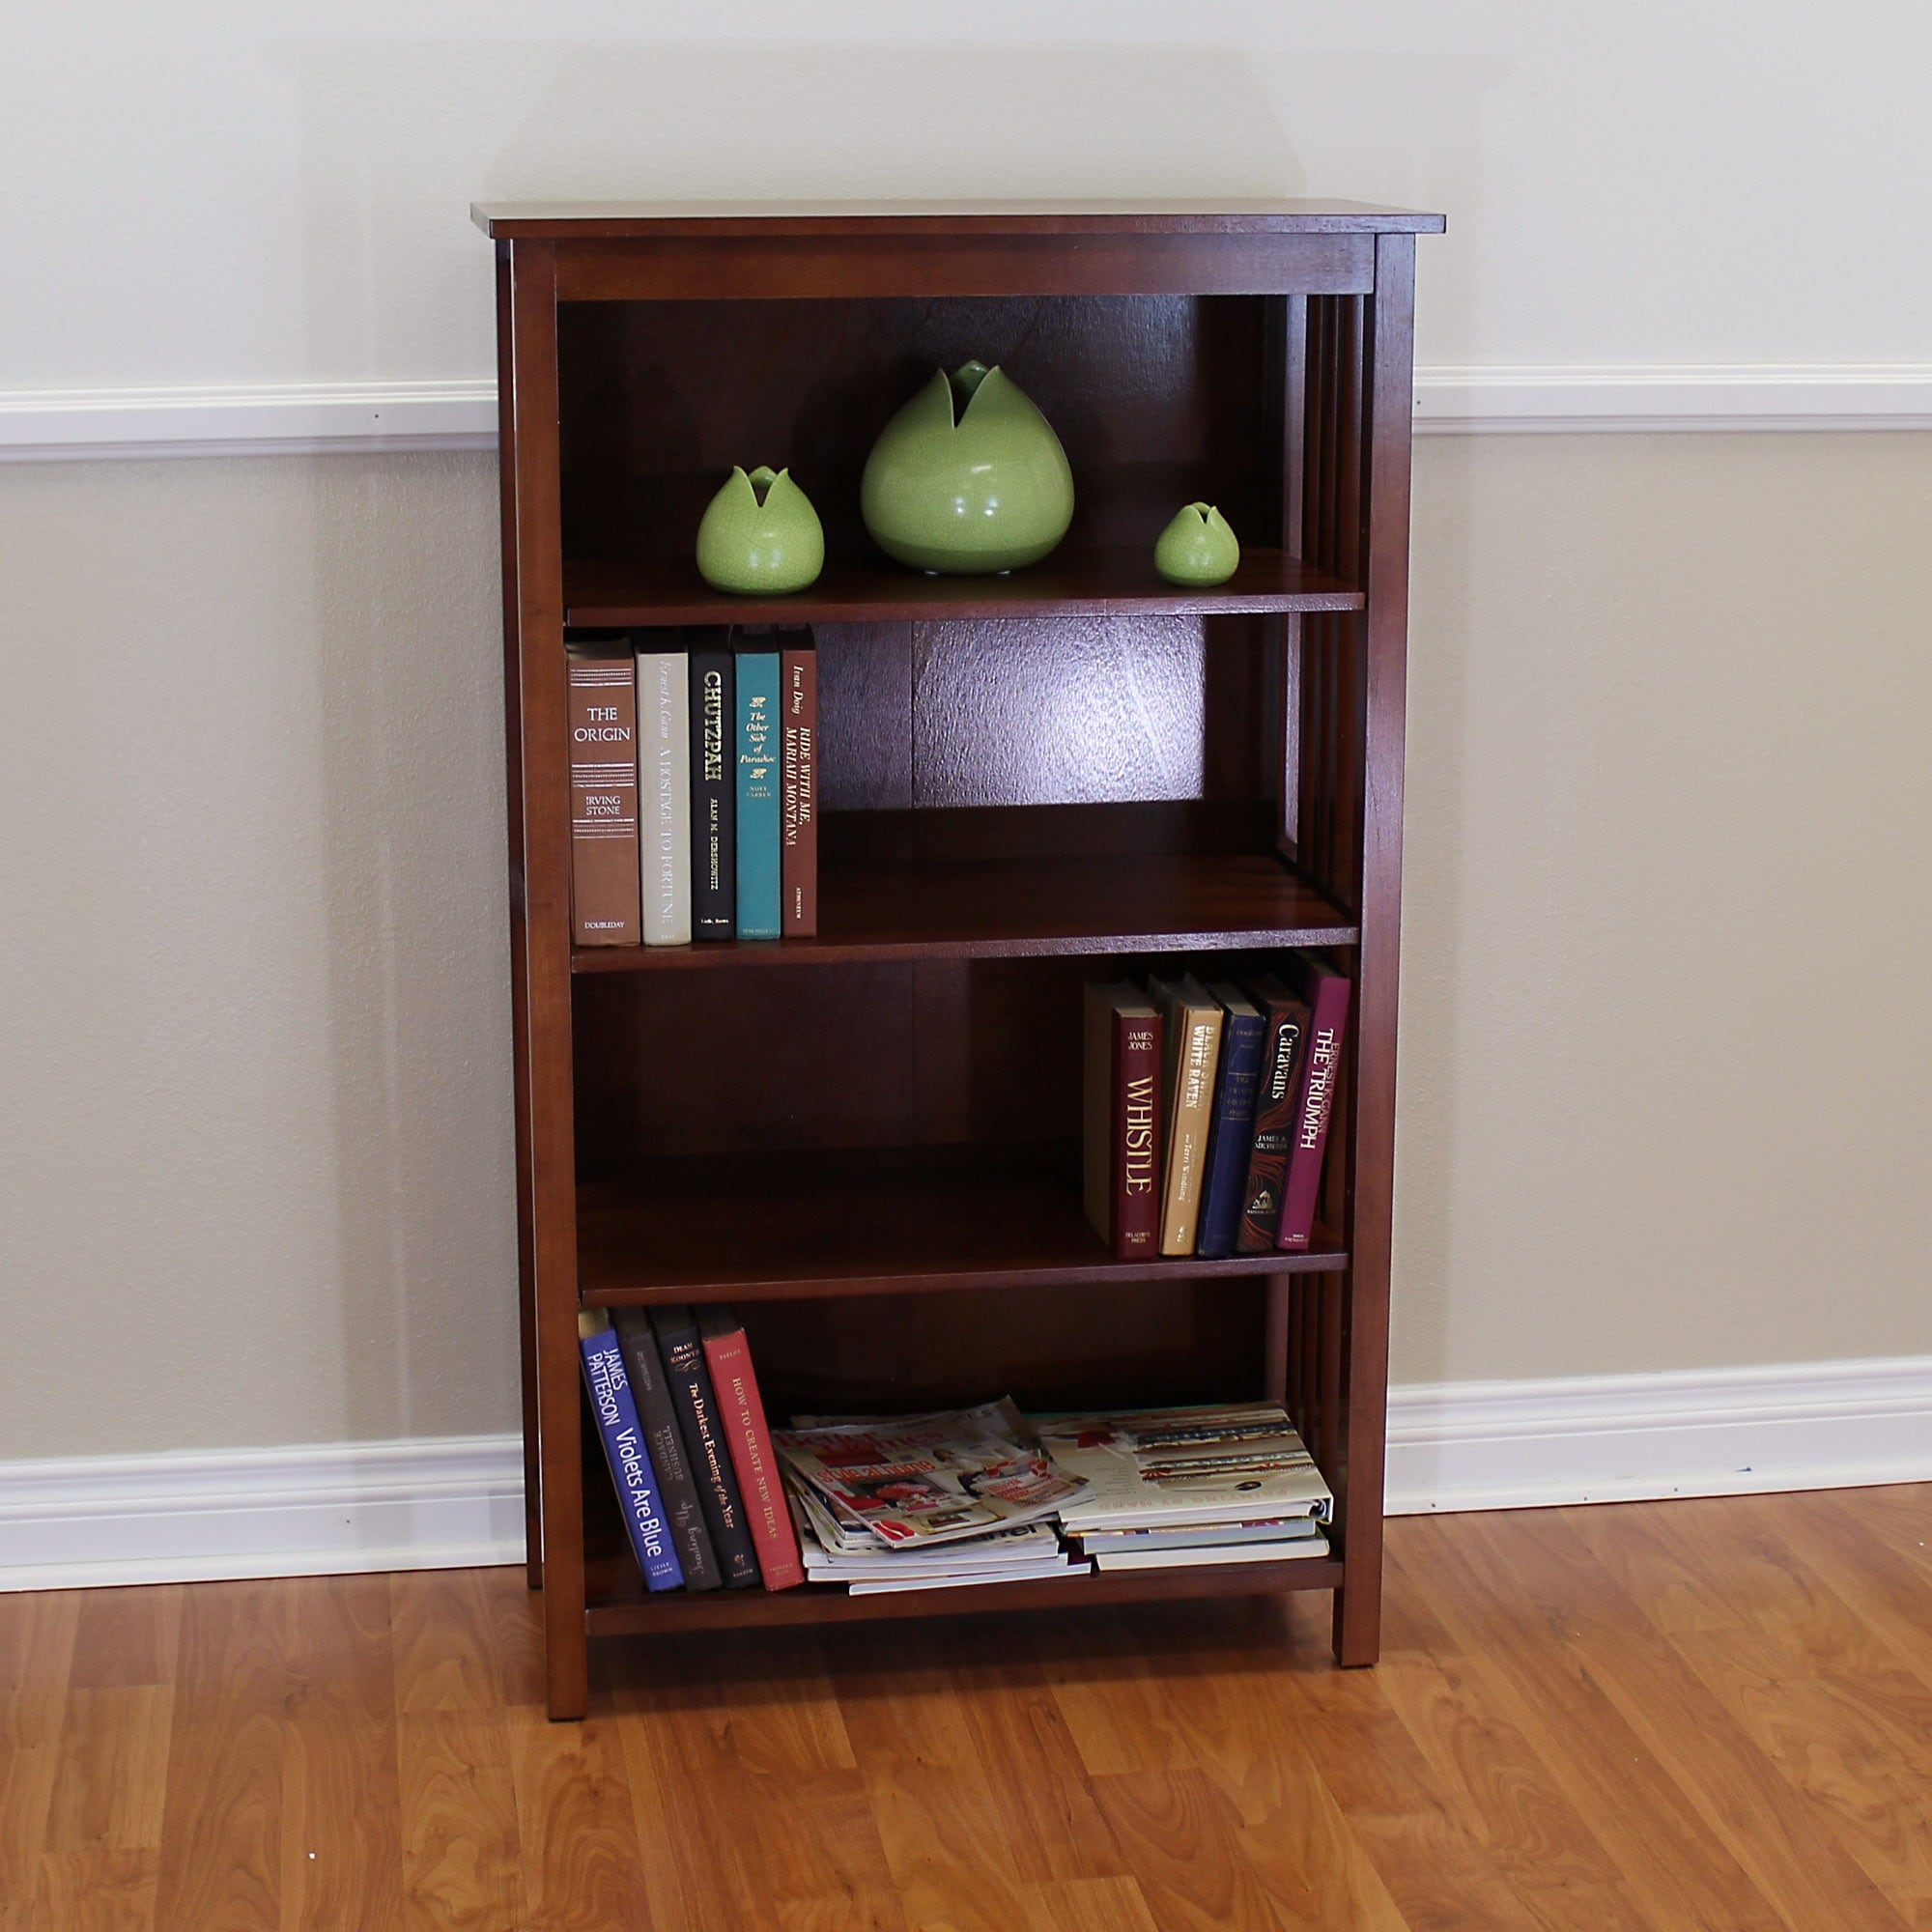 tips your refreshening darleen for update darling bookshelf window under a